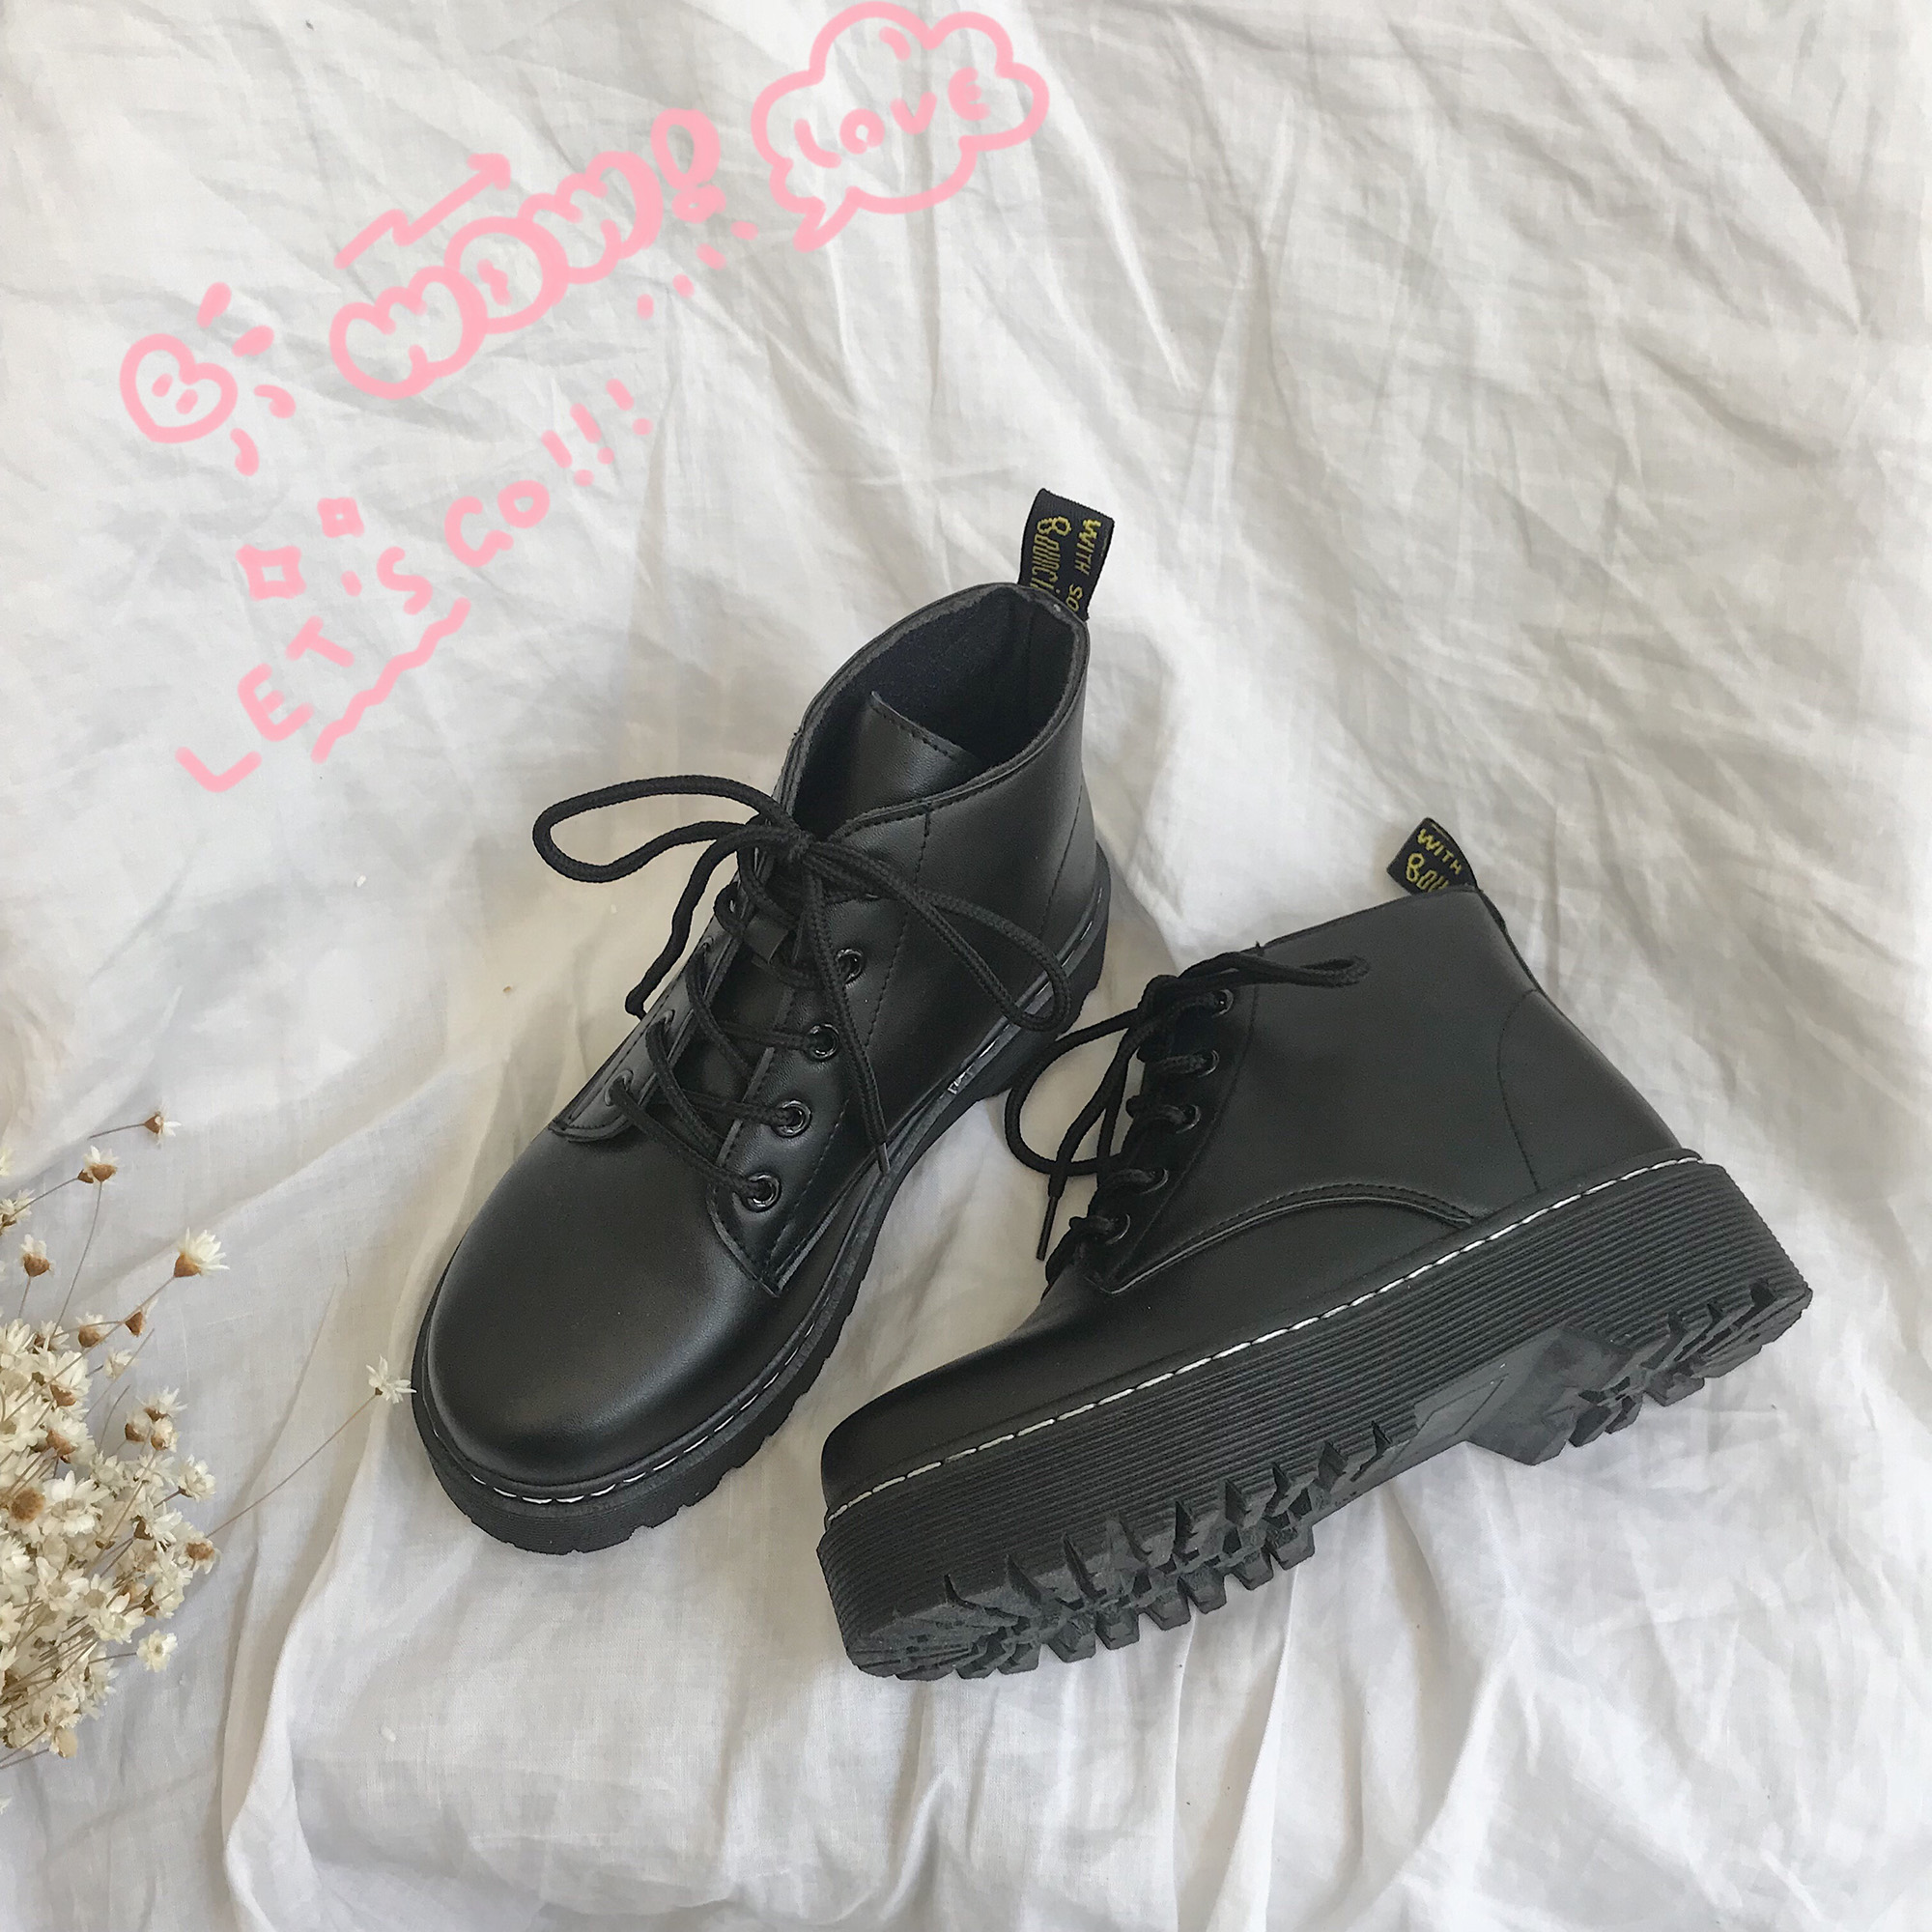 【shoes】熱い販売レトロソリッドカラー厚手ブーツ 13855693